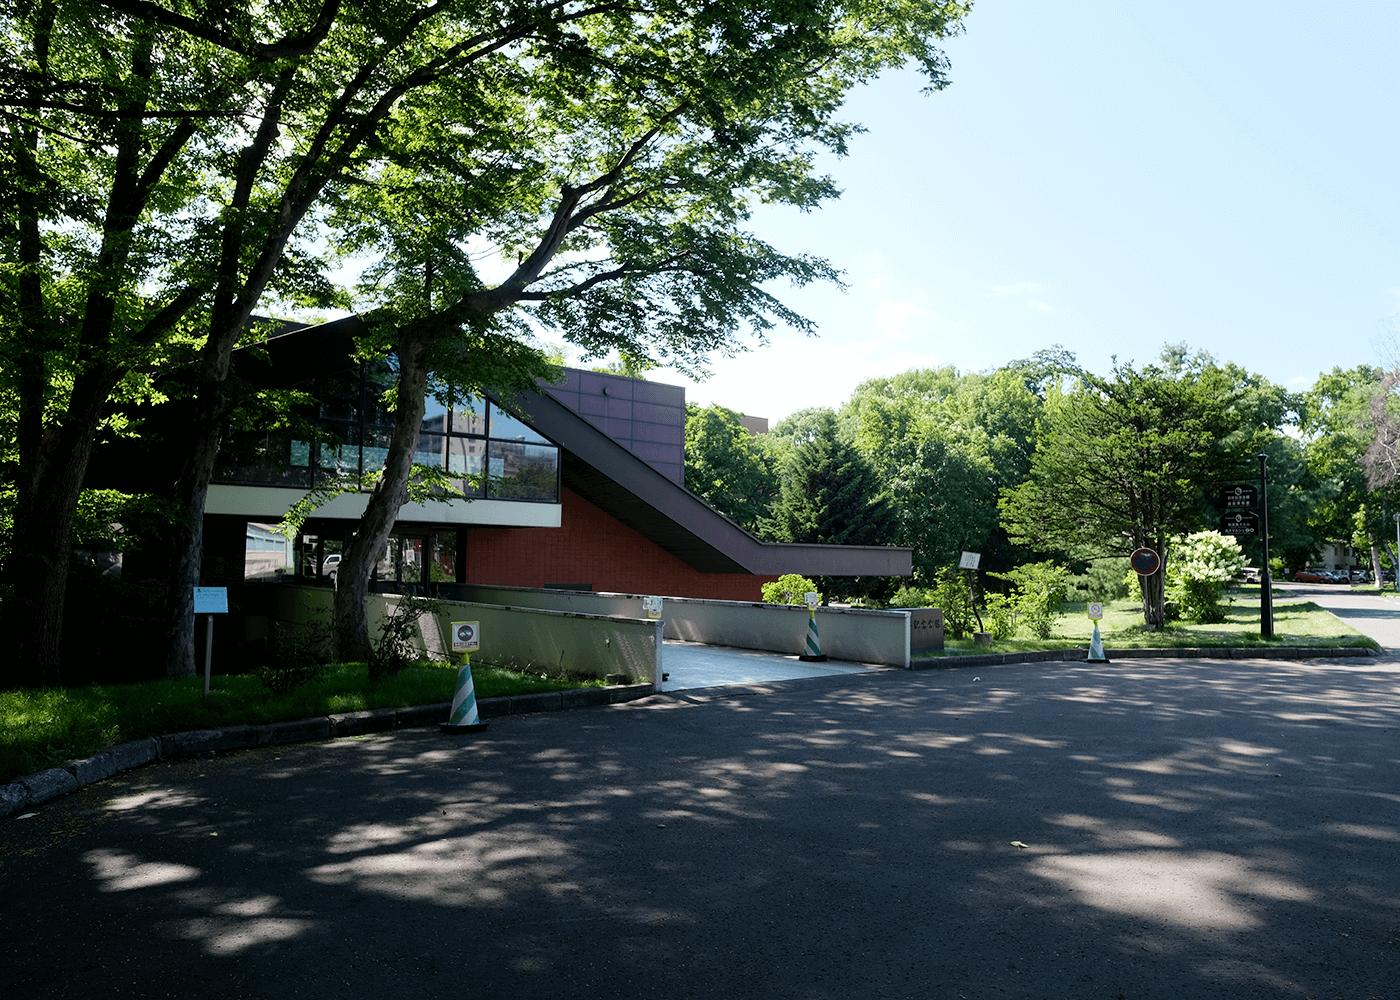 HOKUDAI MARCHE(北大マルシェ)@北海道大学